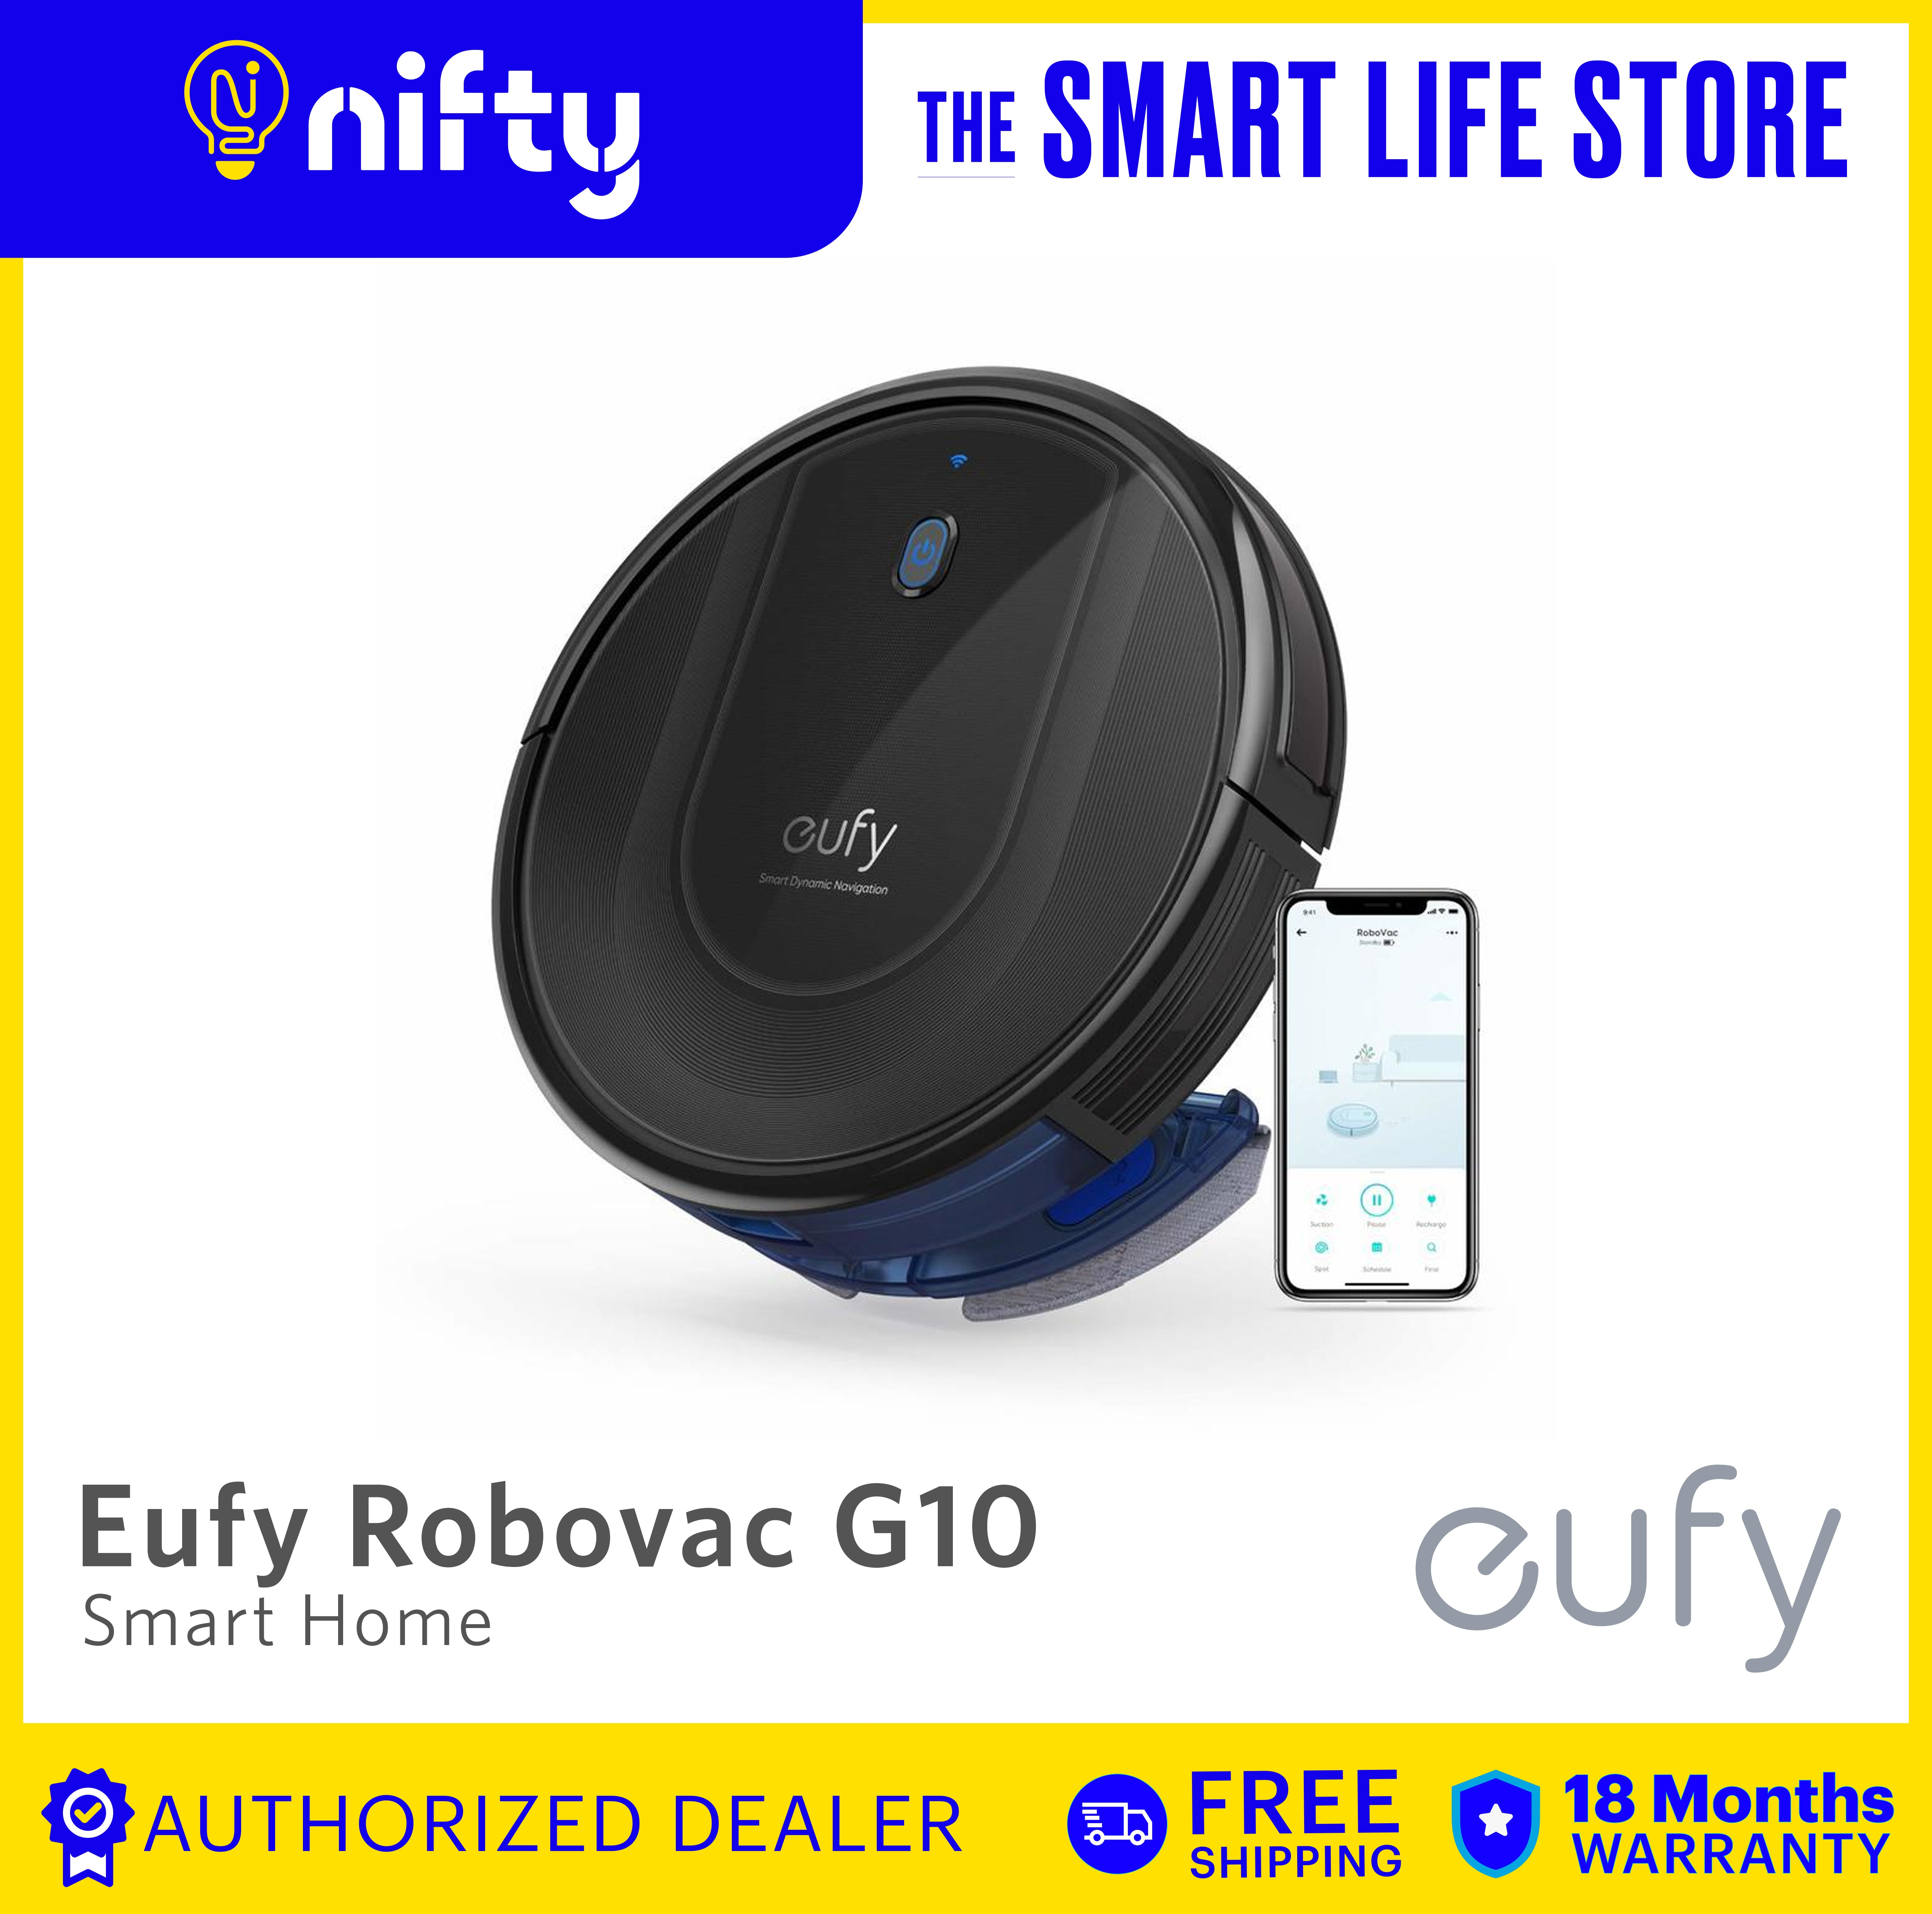 8PCS Side Brush Filter For Eufy Robovac G10 Hybrid Robot Vacuum Cleaner Parts